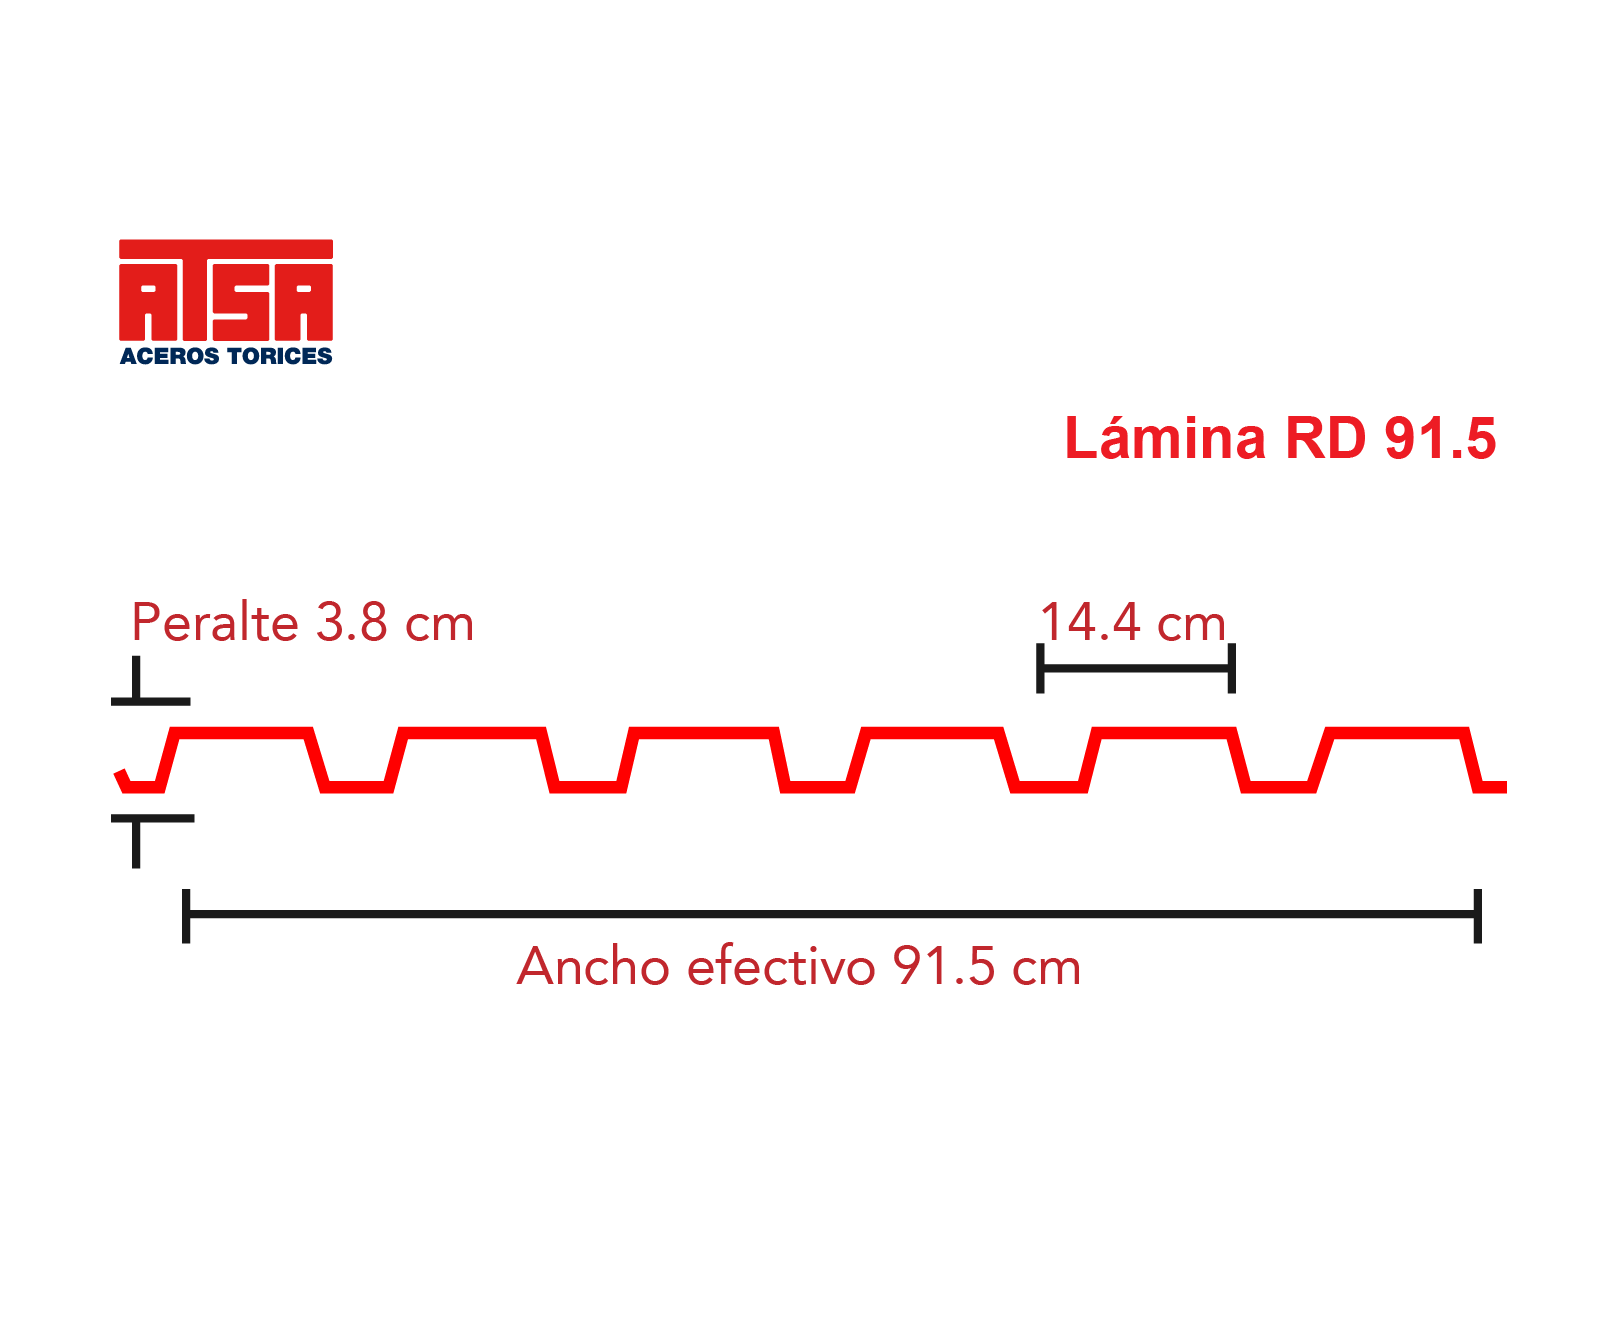 medidas-perfil-rd-91-5-lamina-de-aceros-atsa